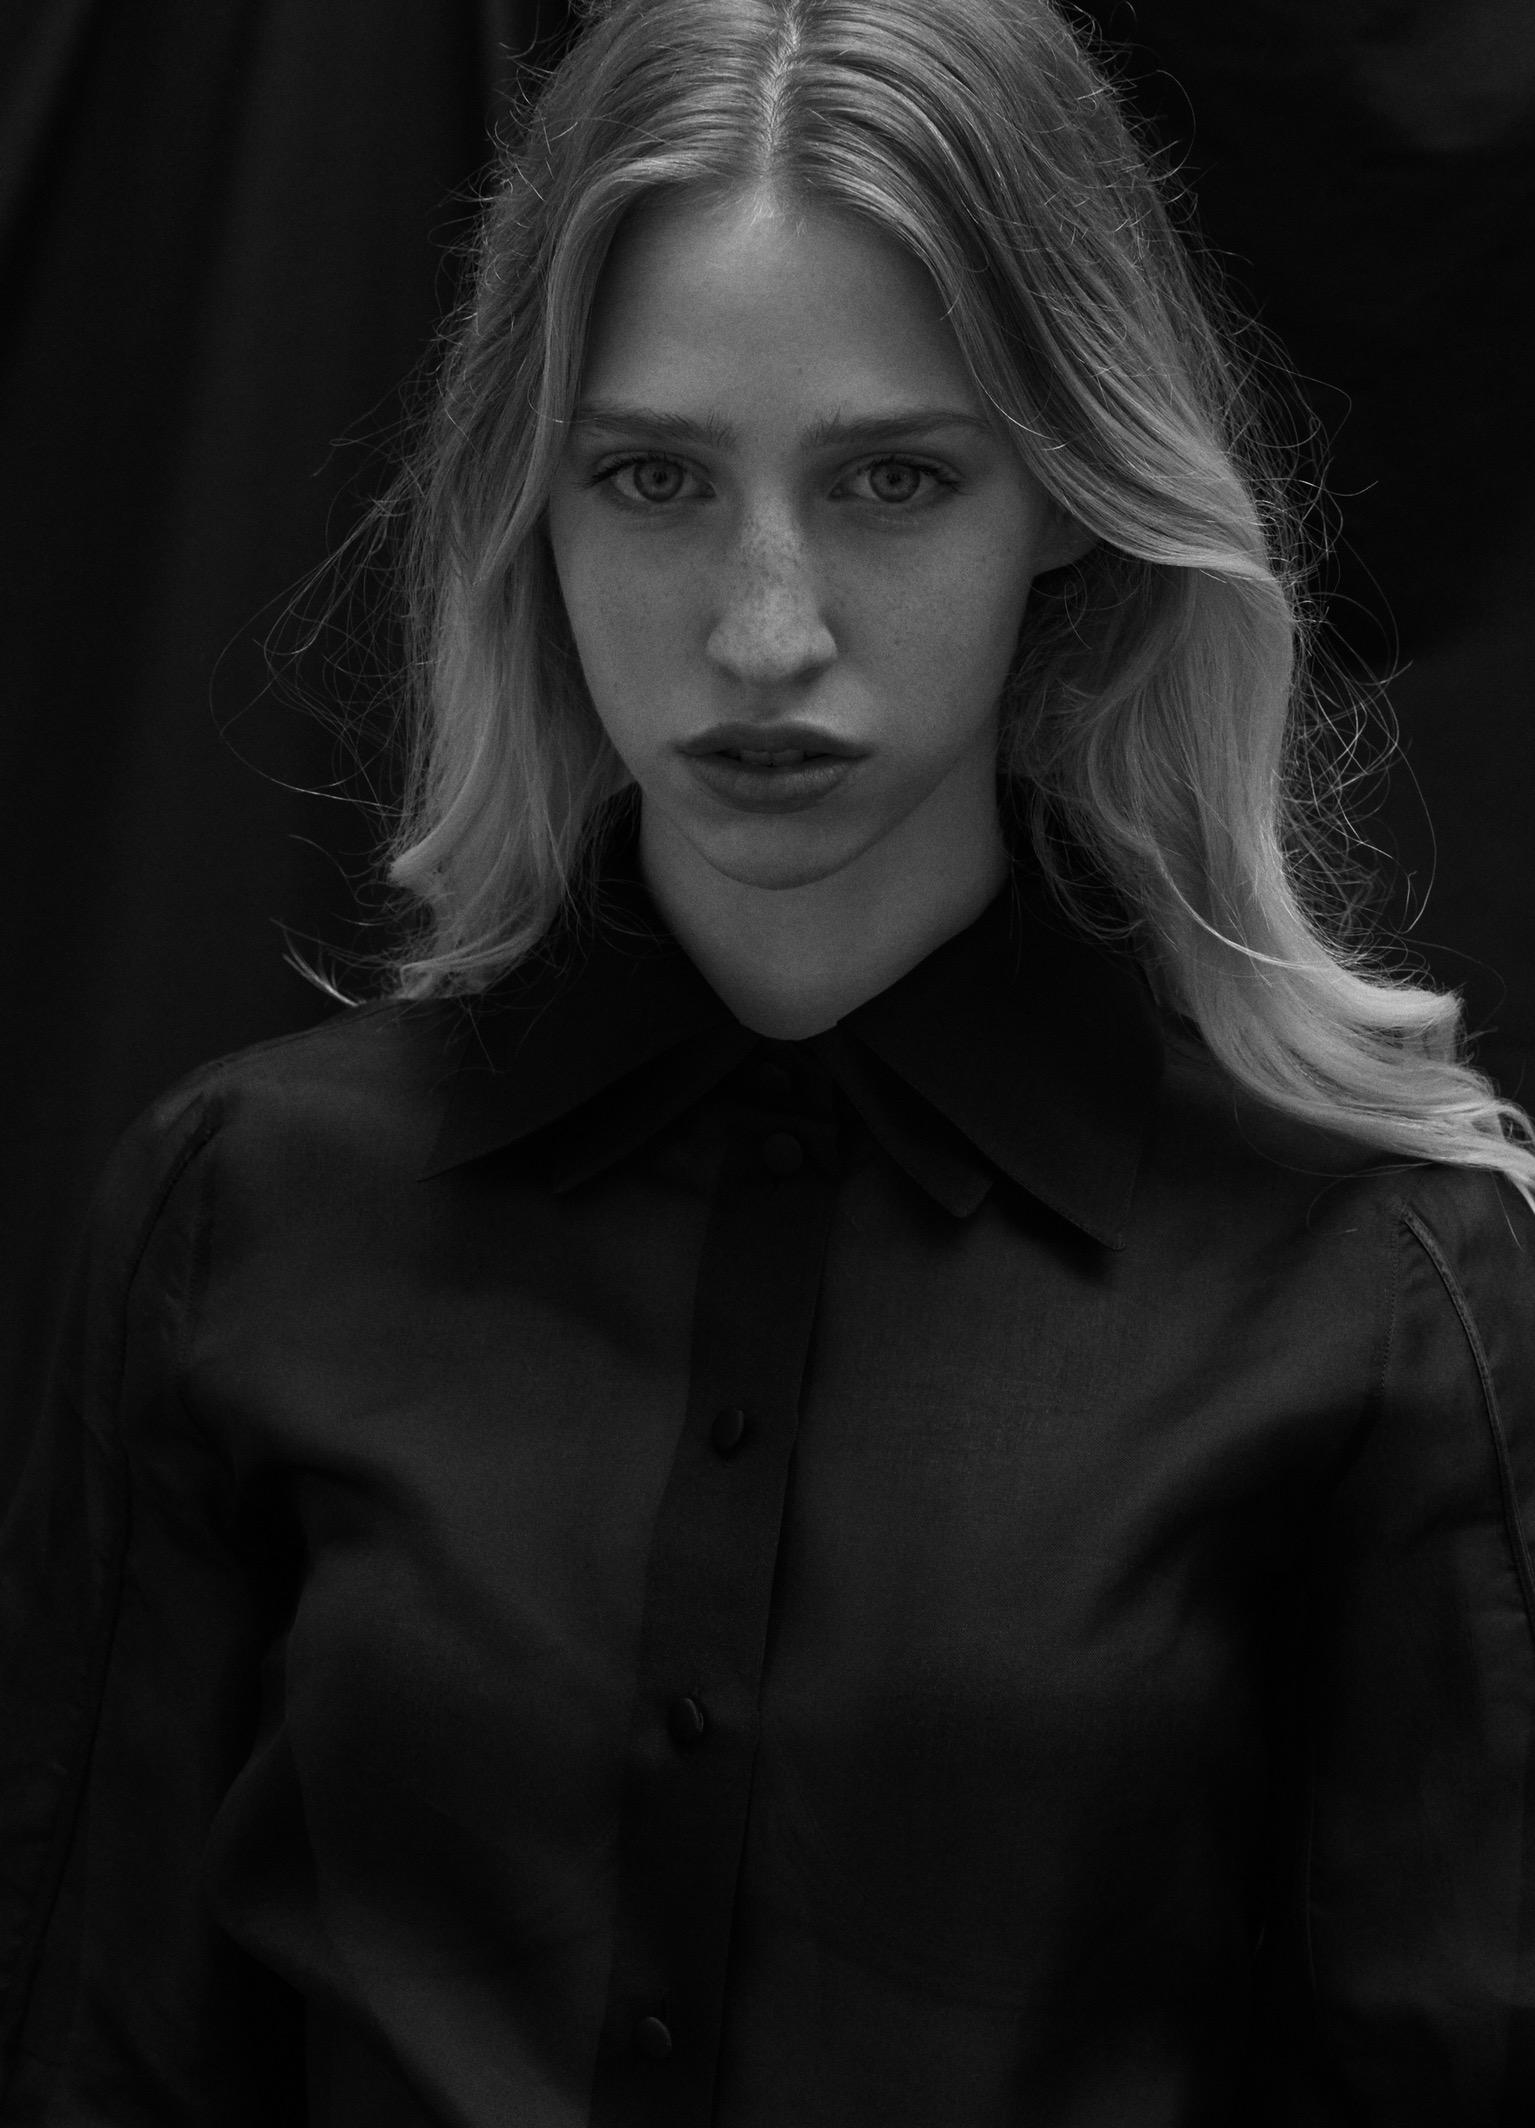 Maja Holm